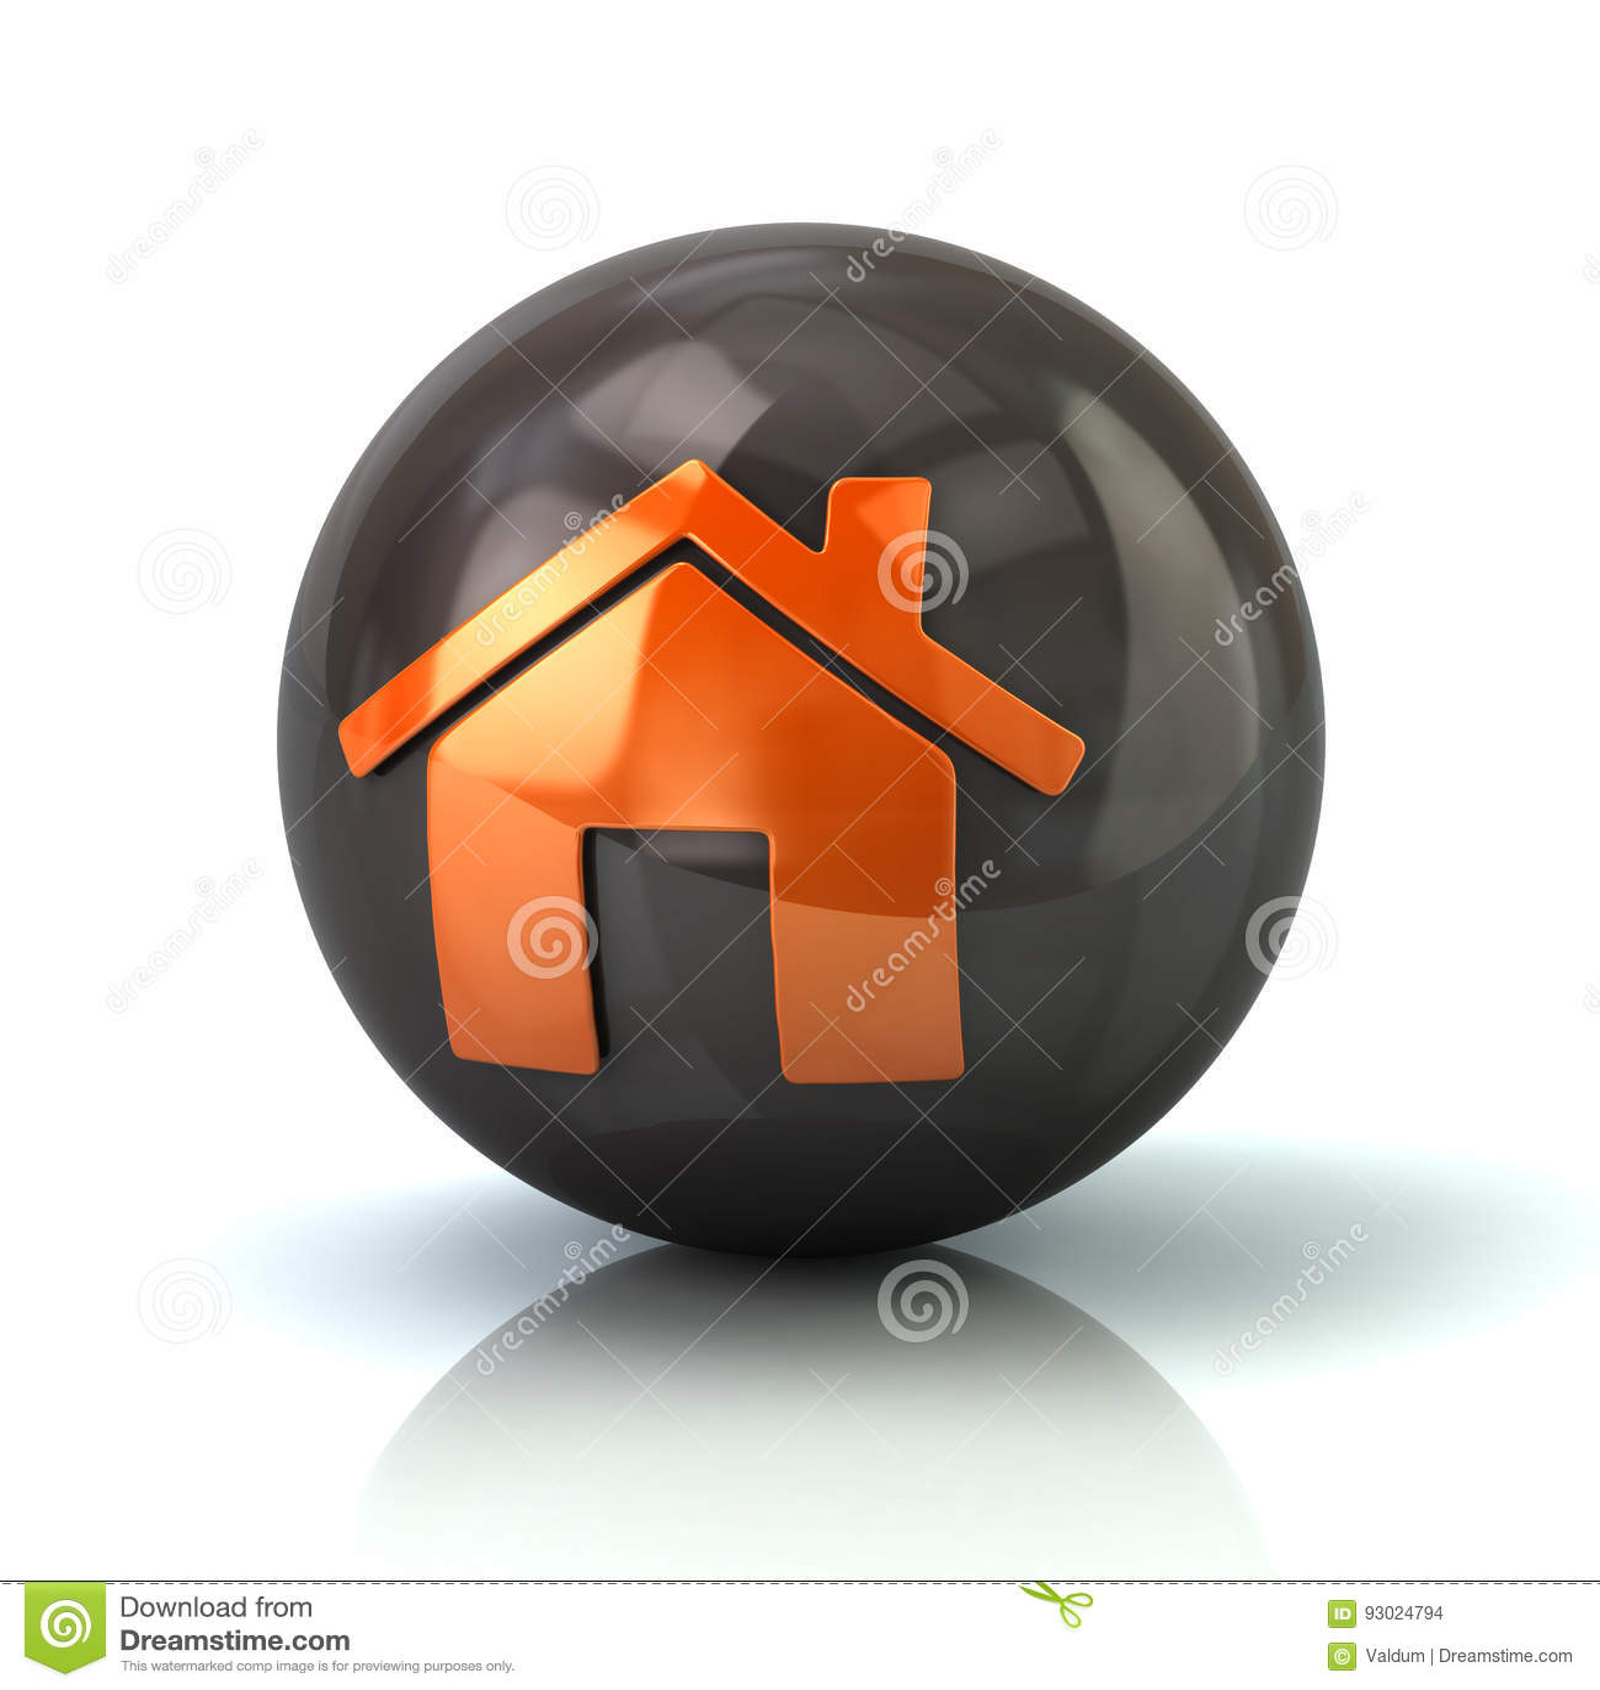 Orange home icon on black glossy sphere